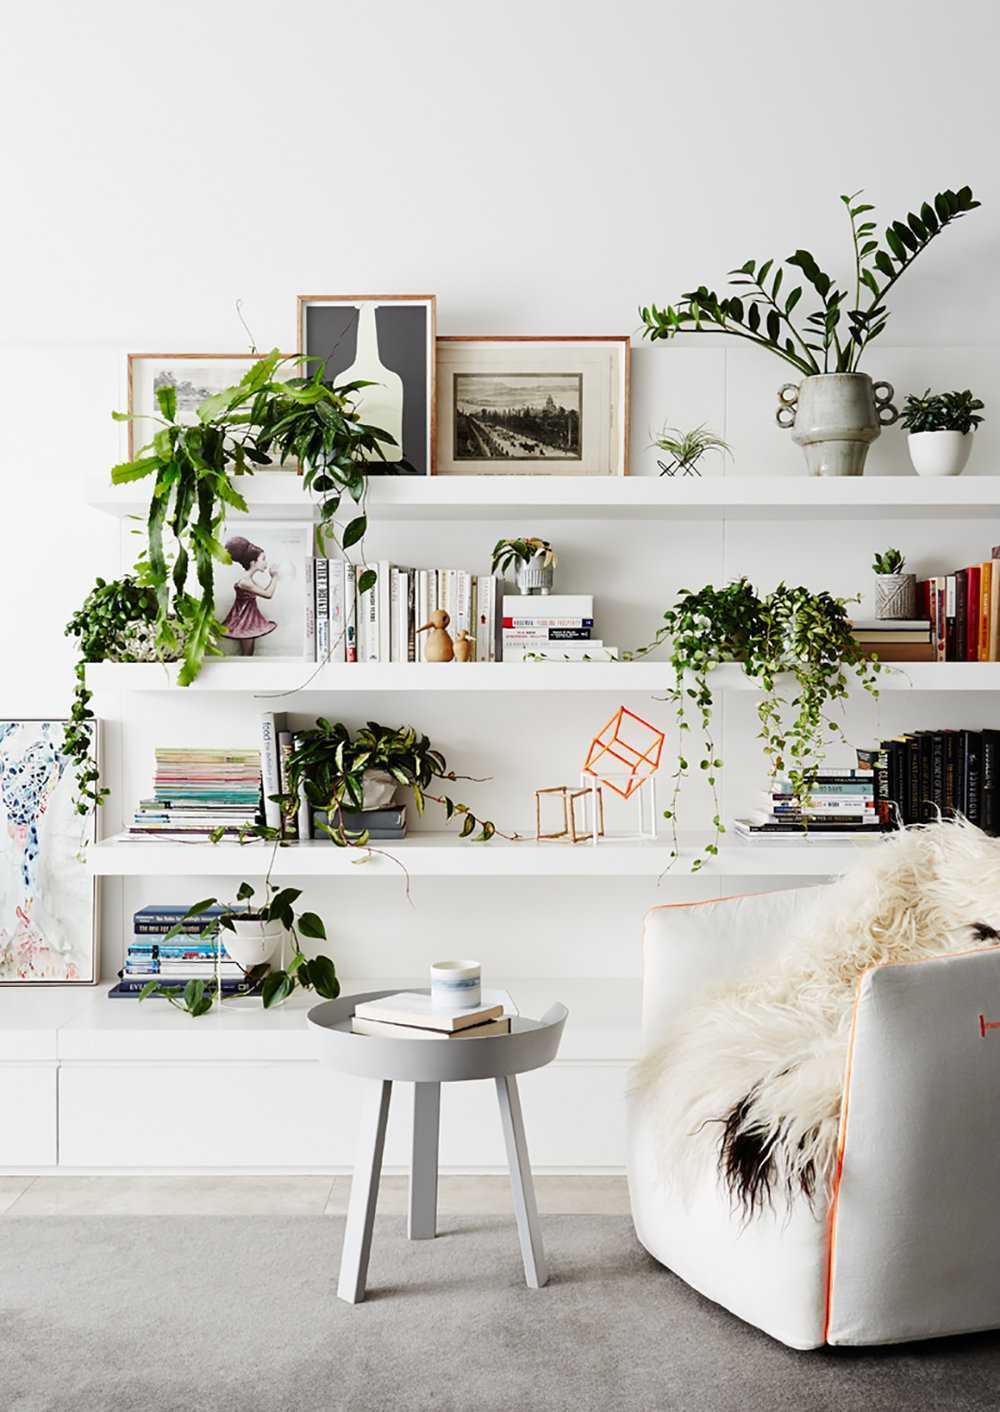 Rak hias pada umumnya hanya diisi dengan bingkai foto, action figure, atau koleksi buku. Tak ada salahnya memilih tanaman hijau berukuran kecil seperti kaktus mini untuk memberikan nuansa hijau ke dalam ruang tamu Anda.